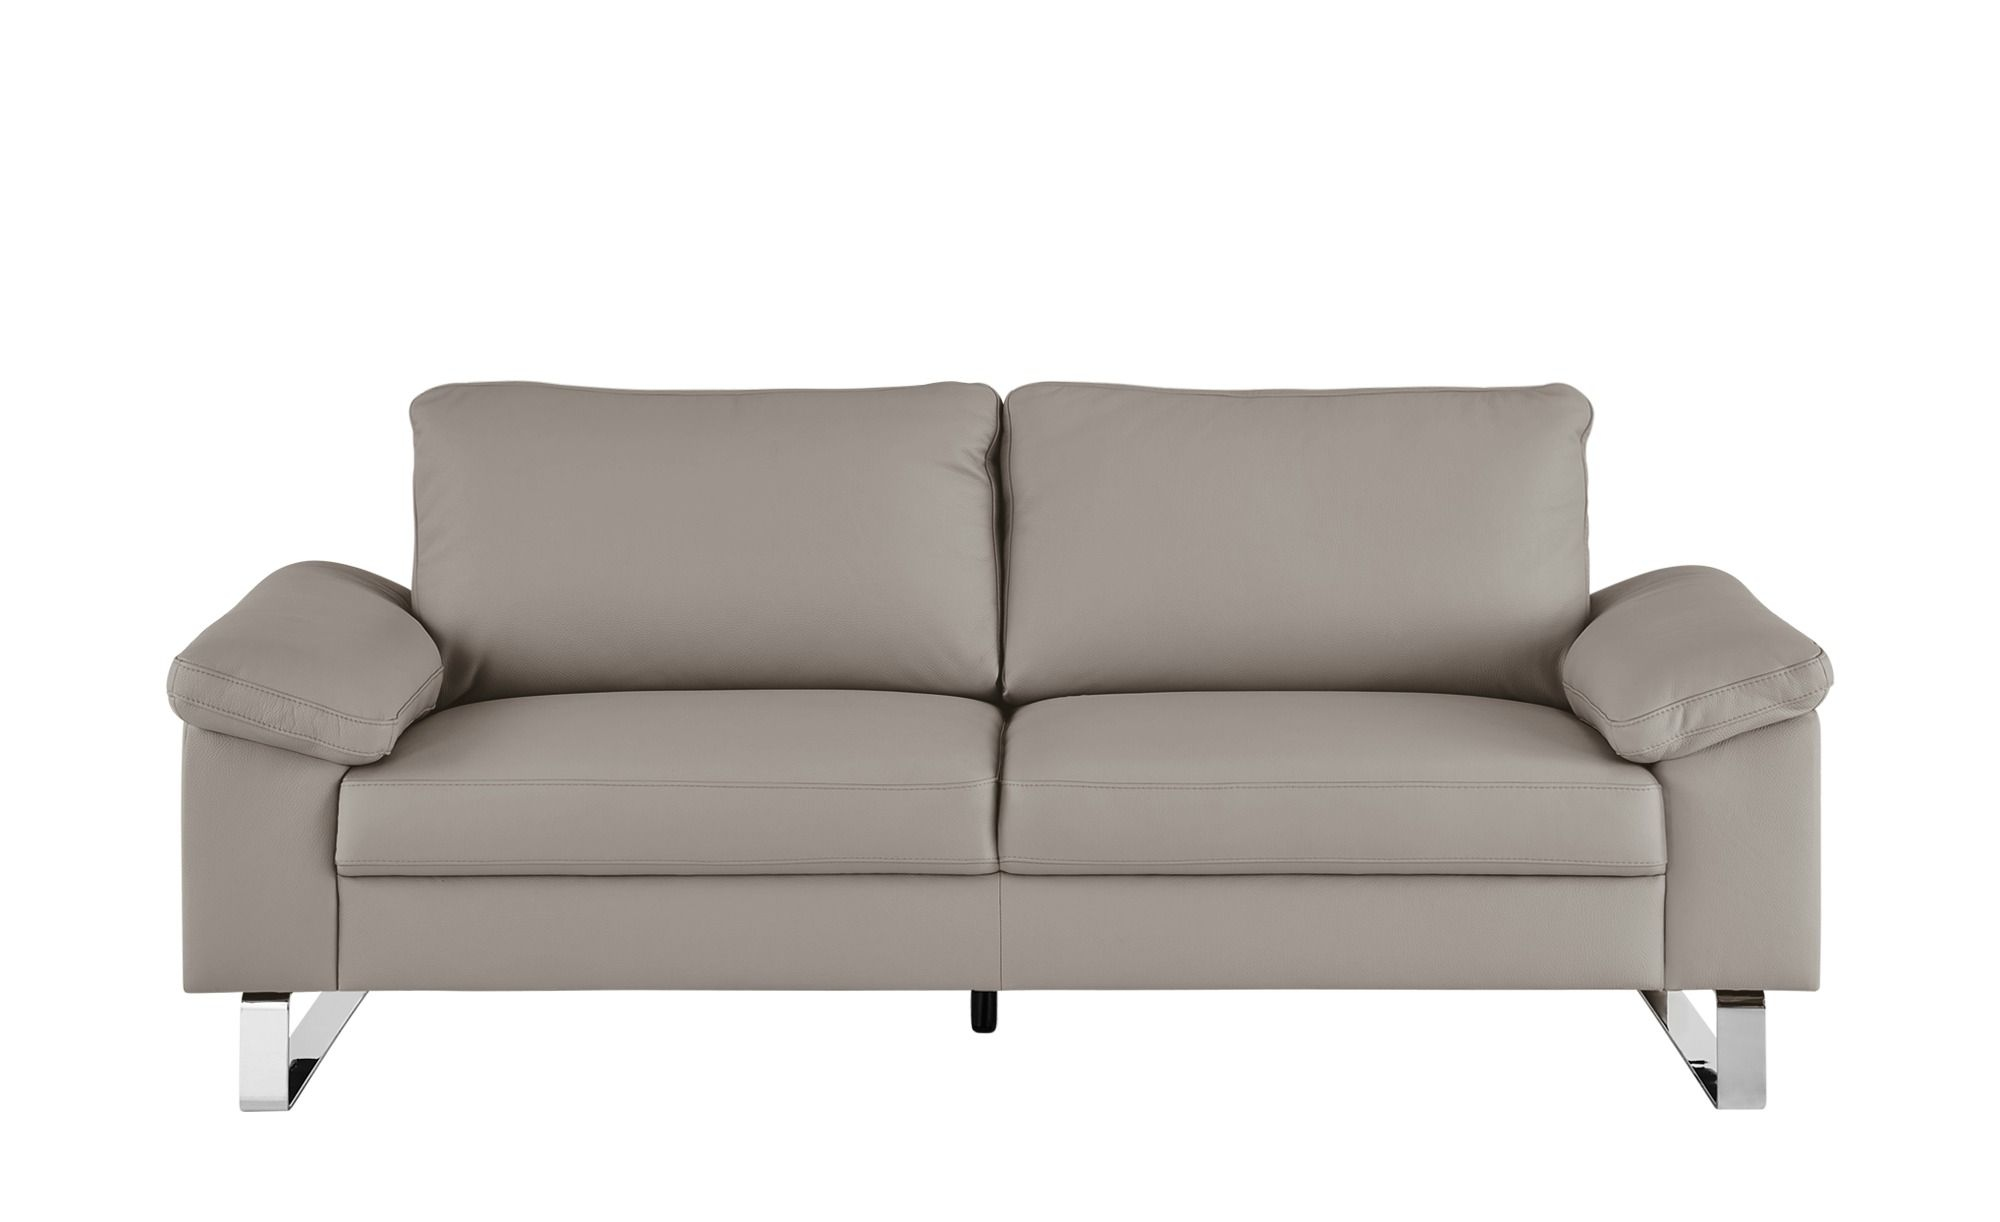 Grune Schlafcouch Chesterfield Sofa For Sale In Dubai